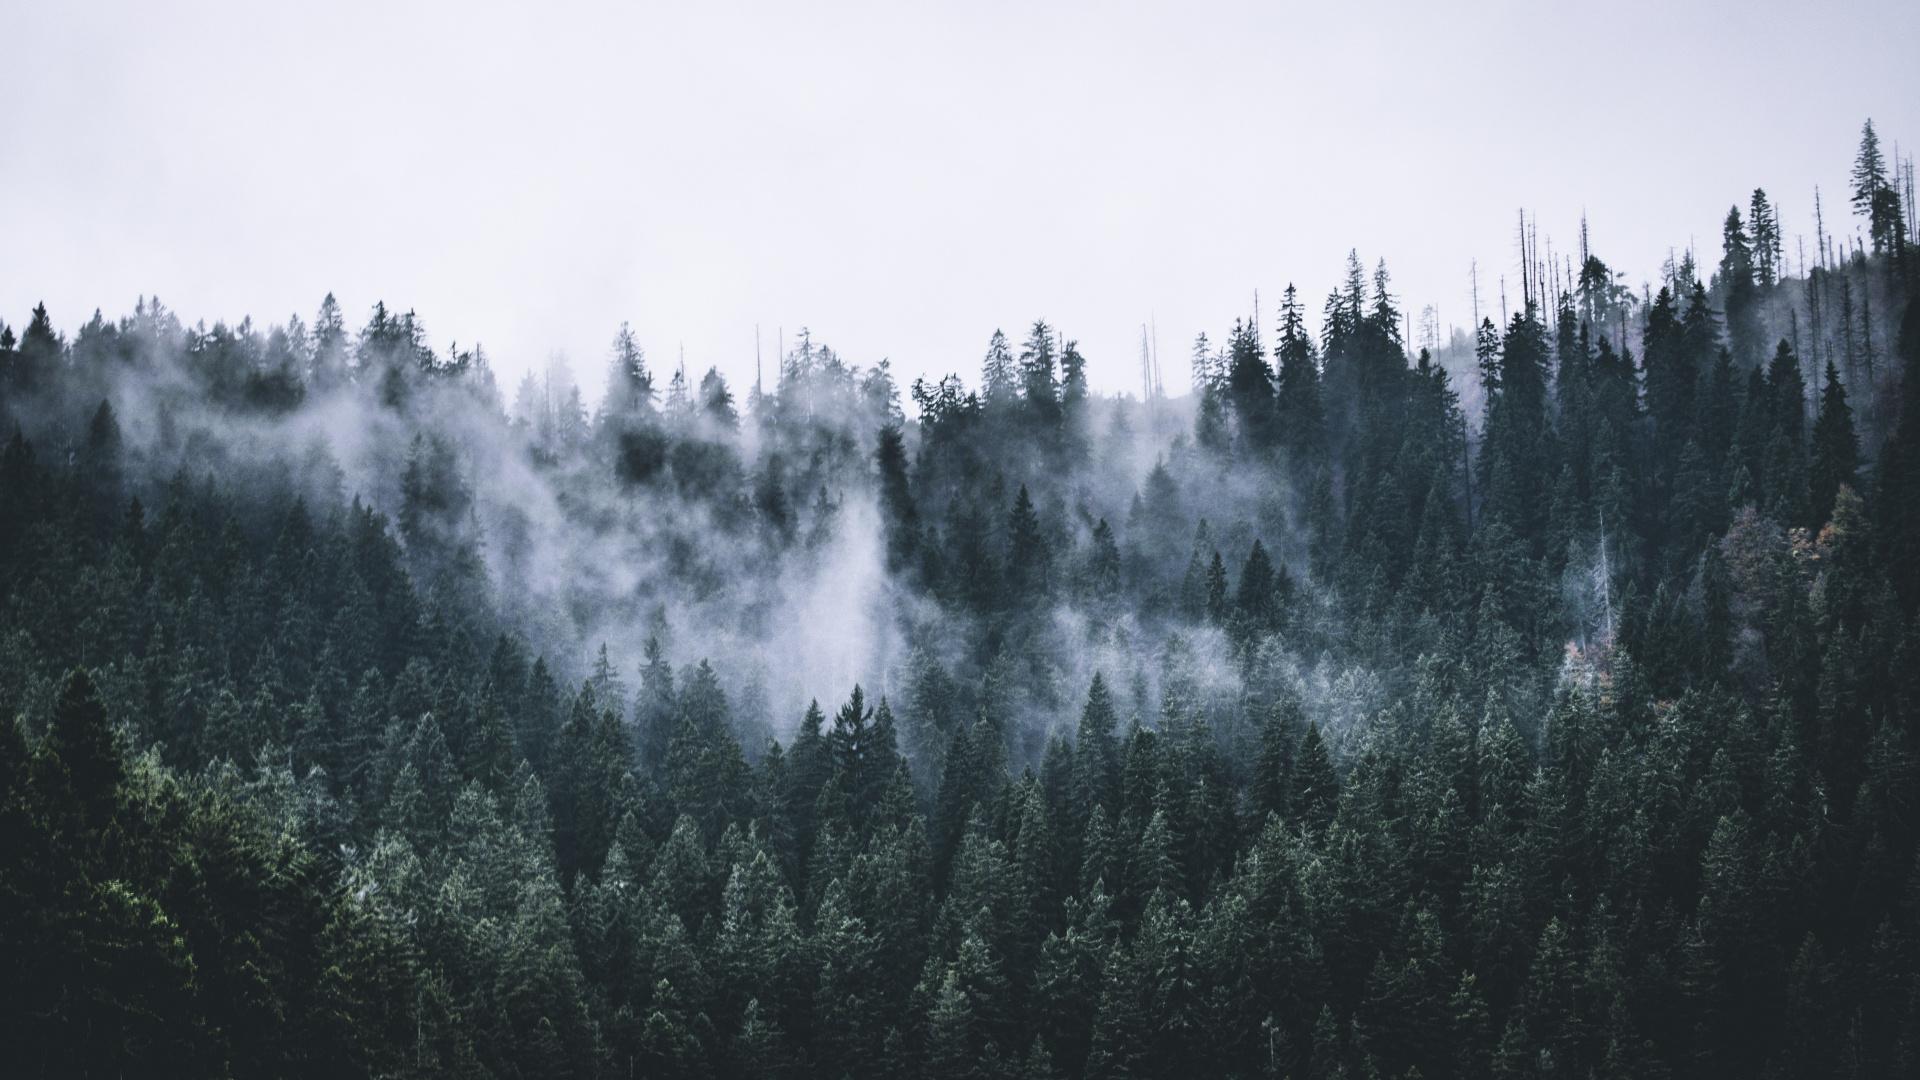 Green, Forest, Fog, Nature, Trees, Dawn, Wallpaper - Iphone Wallpaper Forest Fog - HD Wallpaper